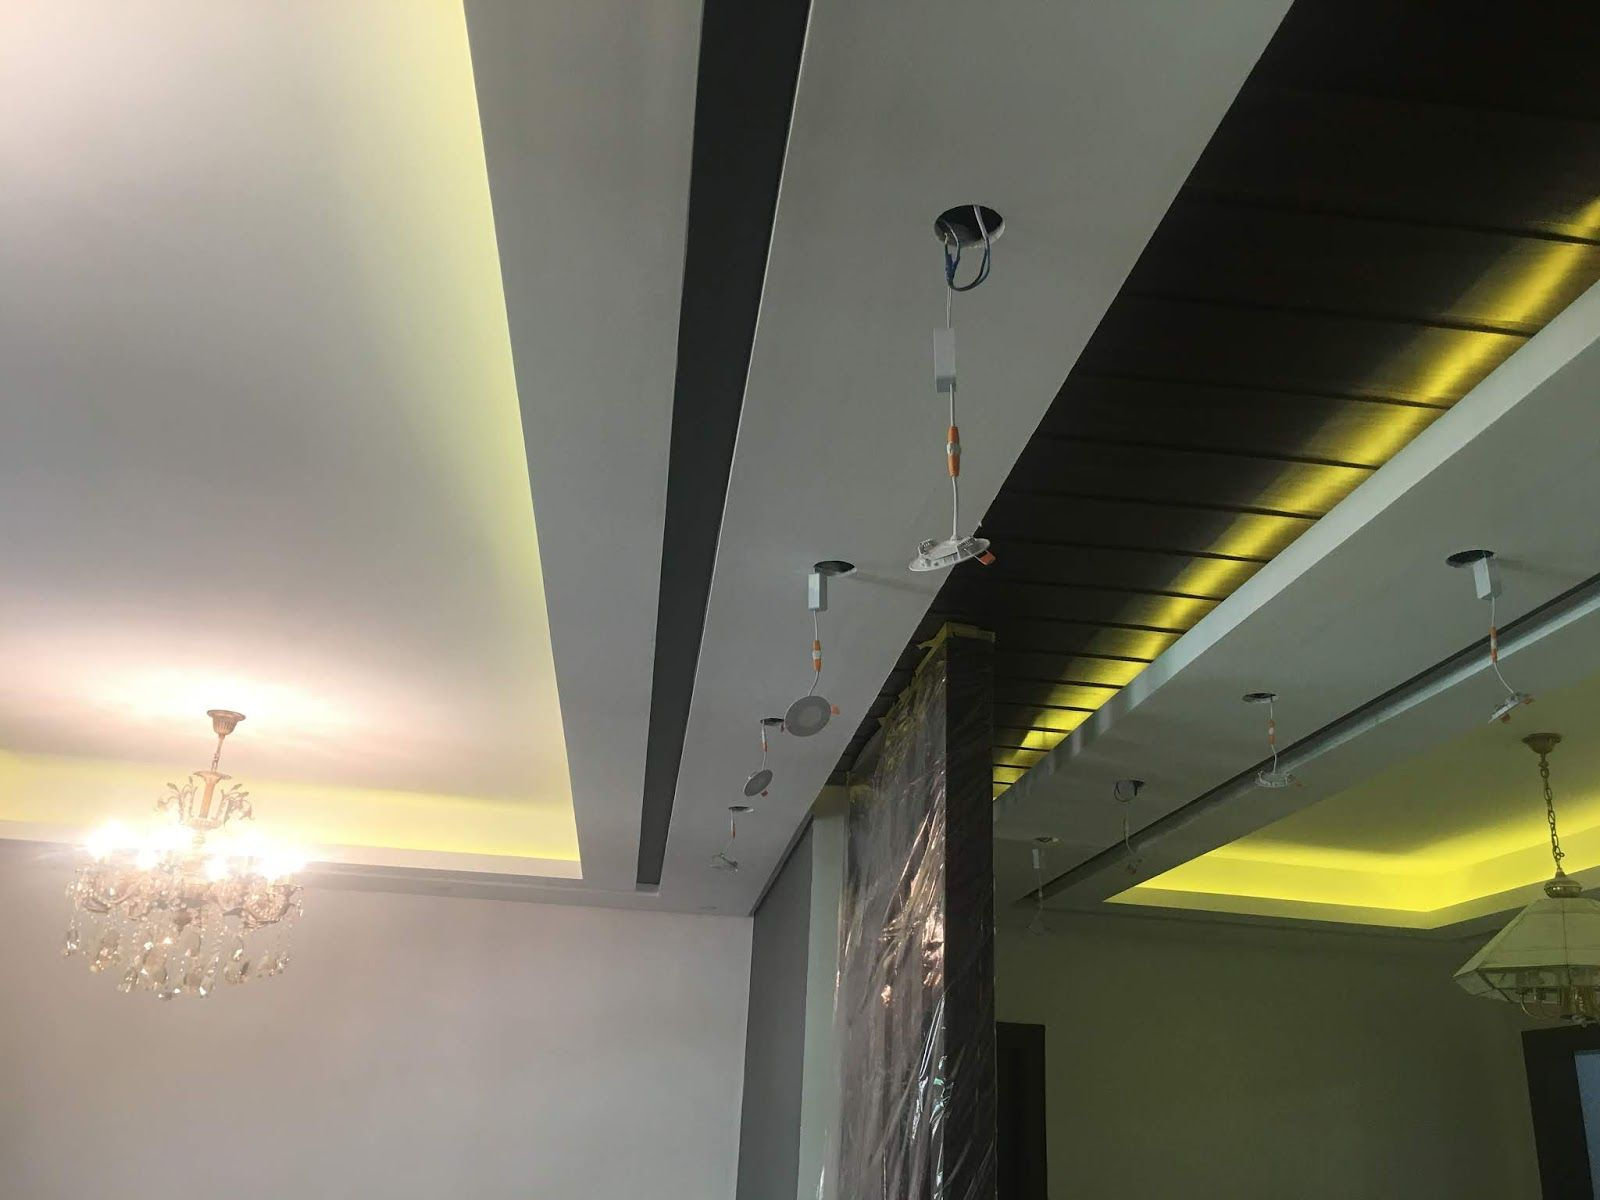 صور ديكورات جبسم بورد 2018 Gypsum Decoration Interior Design Gypsum Decoration Ceiling Lights Design